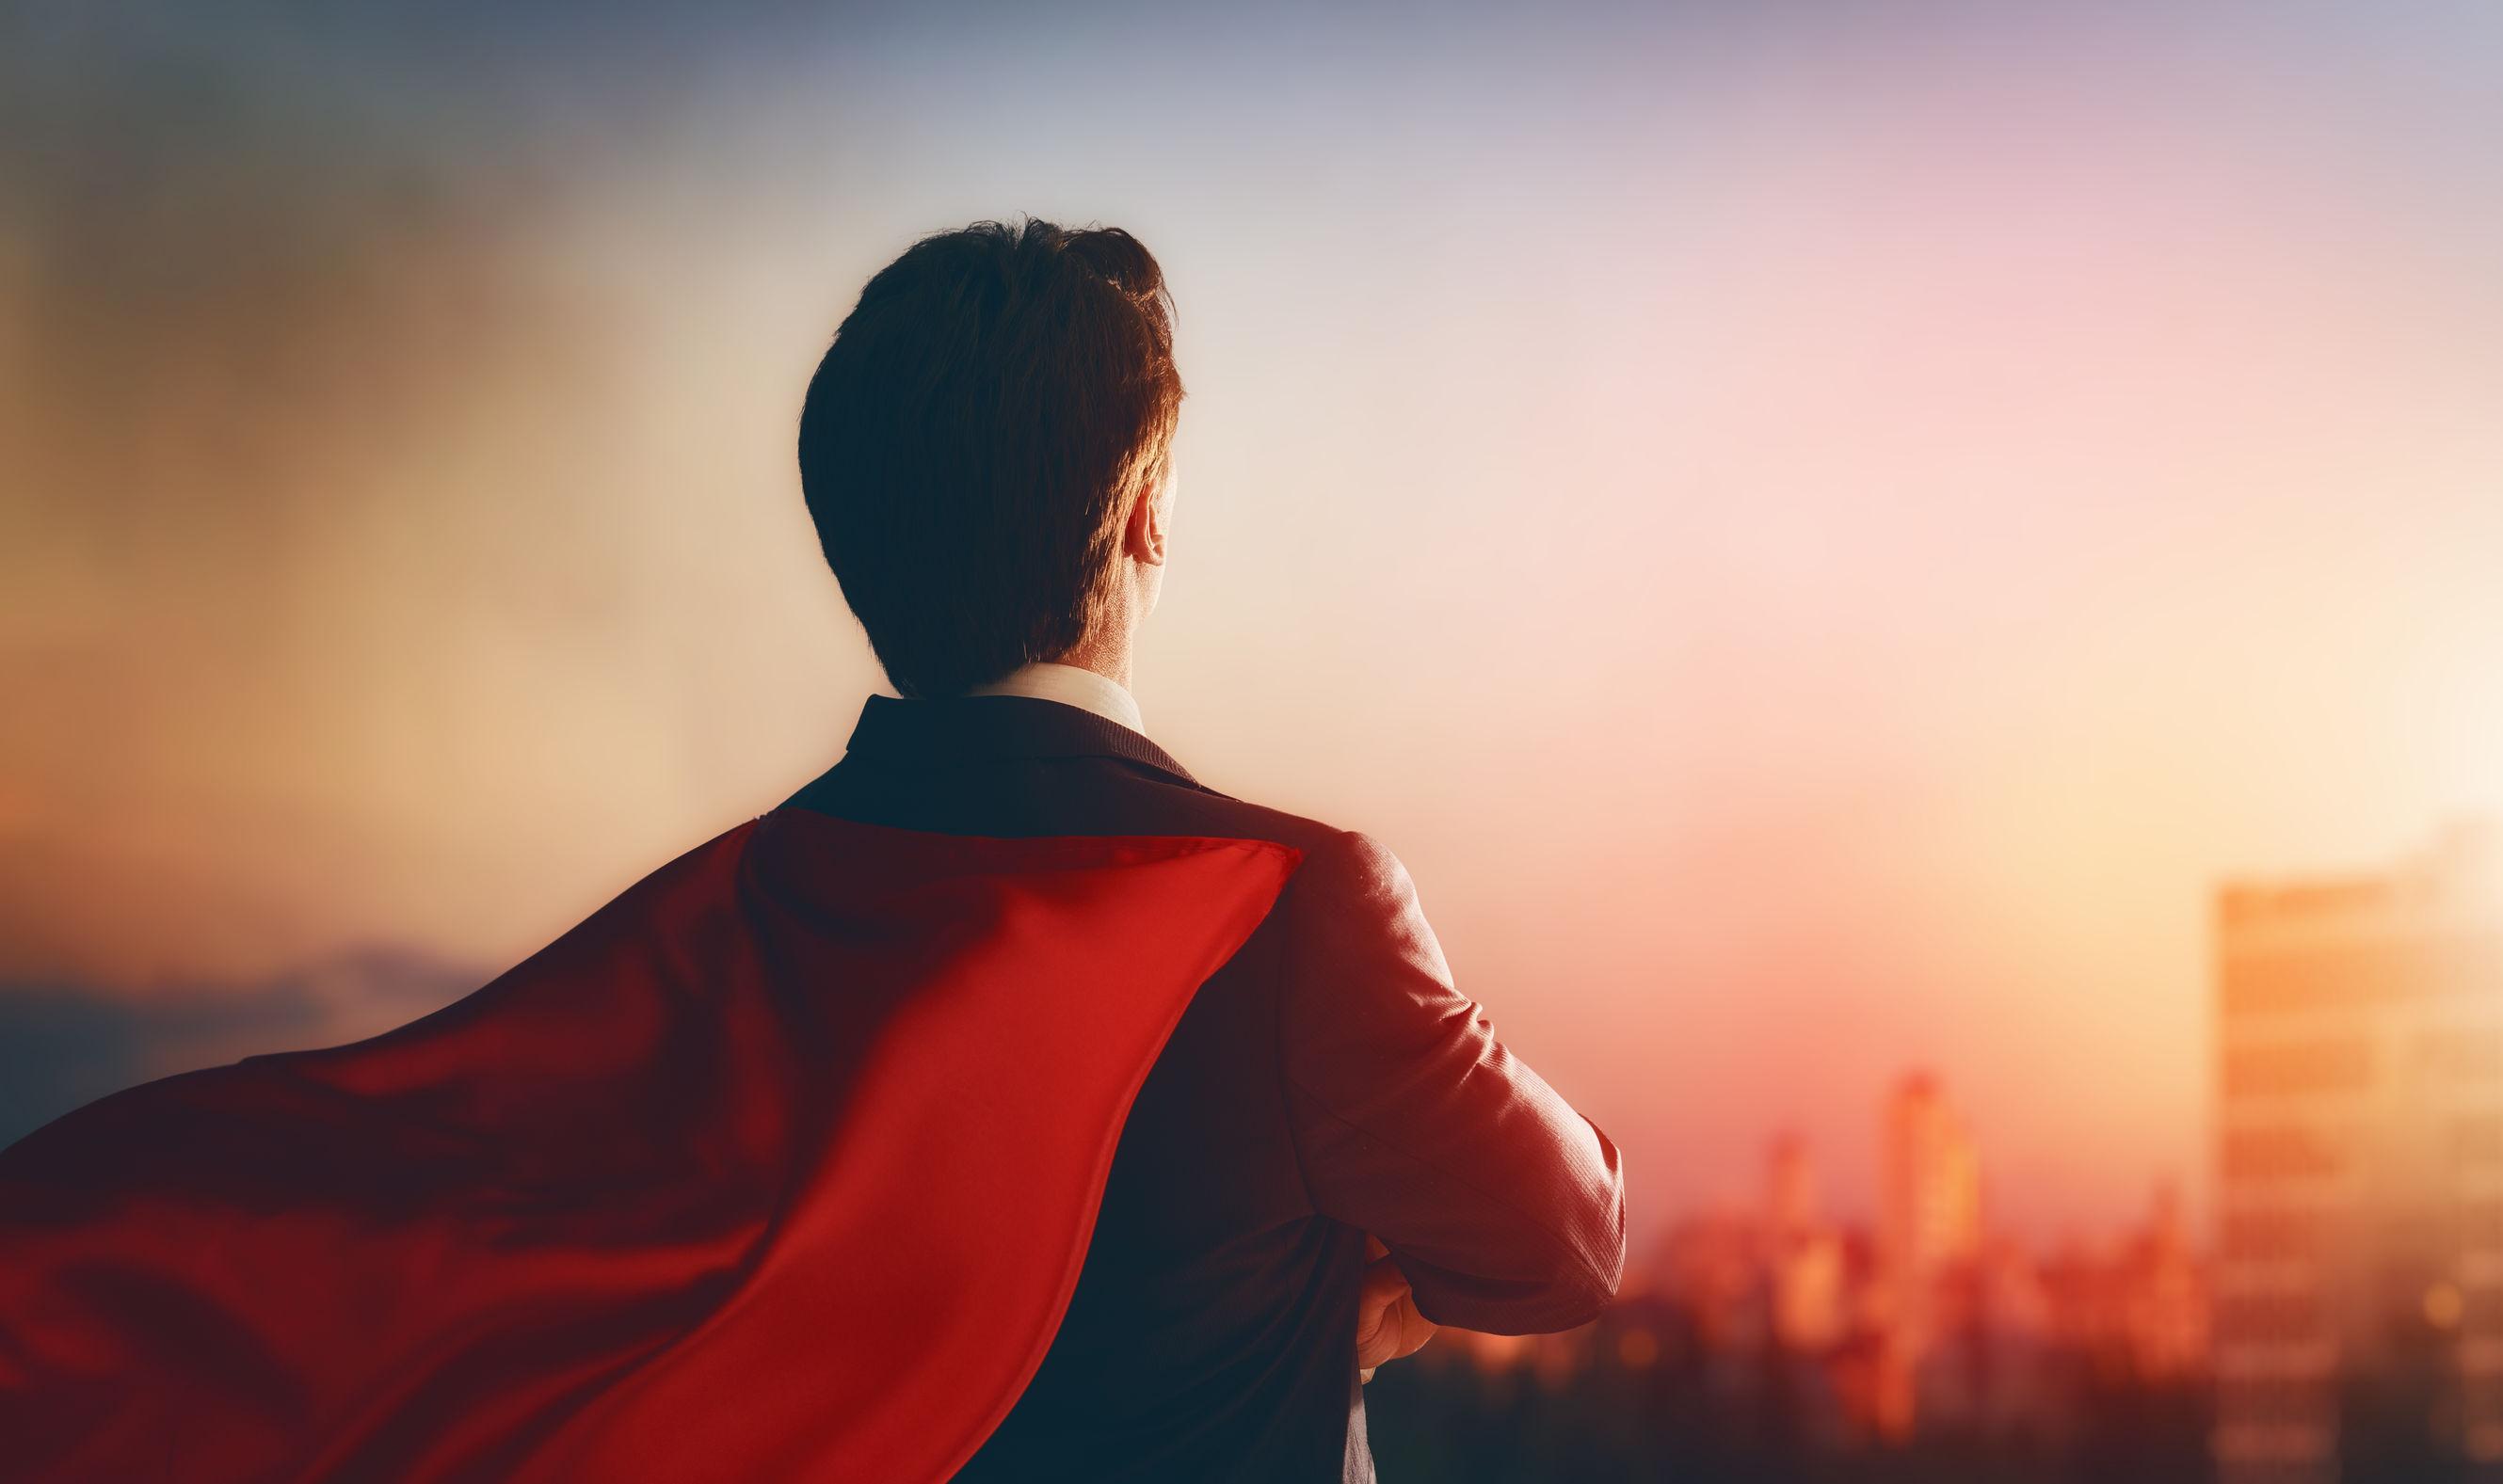 superhero businessman looking at city skyline at sunset.